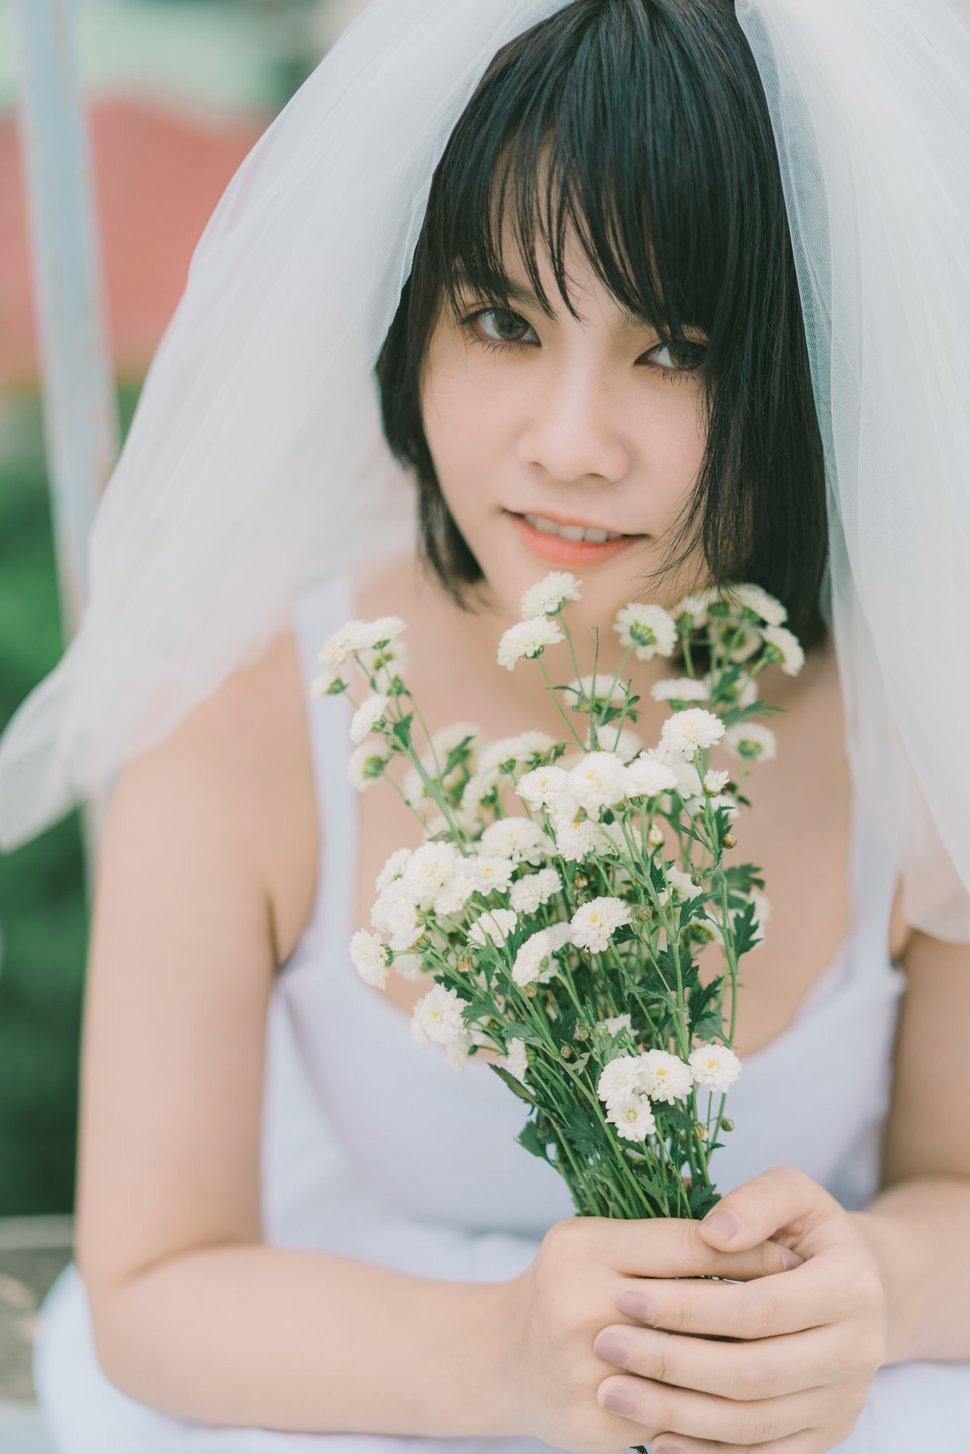 3C9DDC41-F7FF-4E62-B4CD-602C112A7606 - 有溫度的妝/Millet make up《結婚吧》